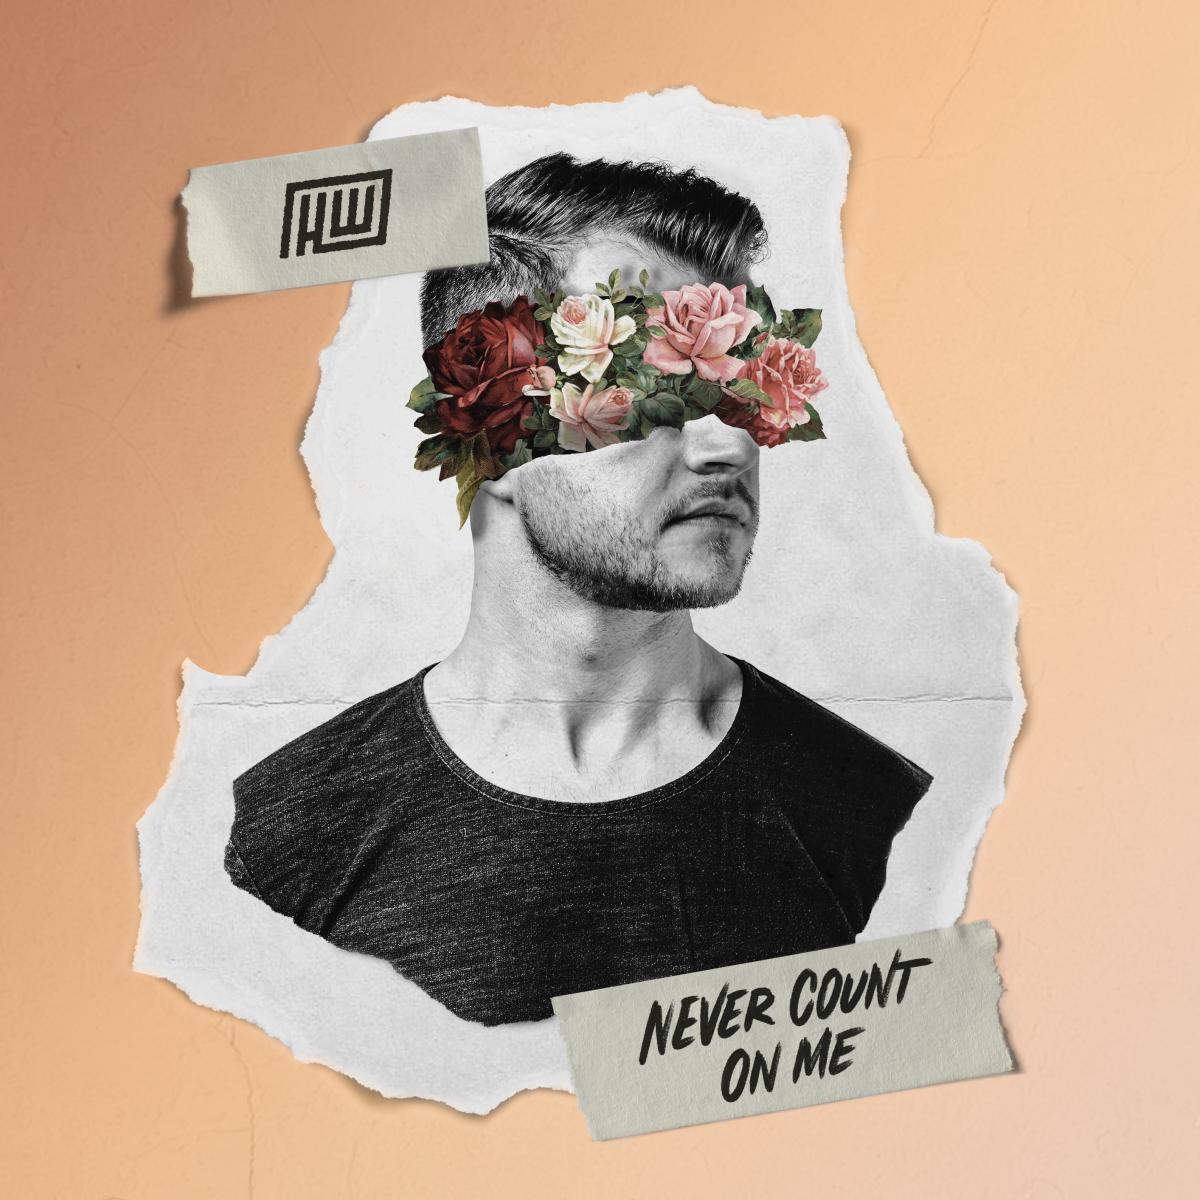 Haywyre - Never Count On Me - Single Release (ALBUM ARTWORK)